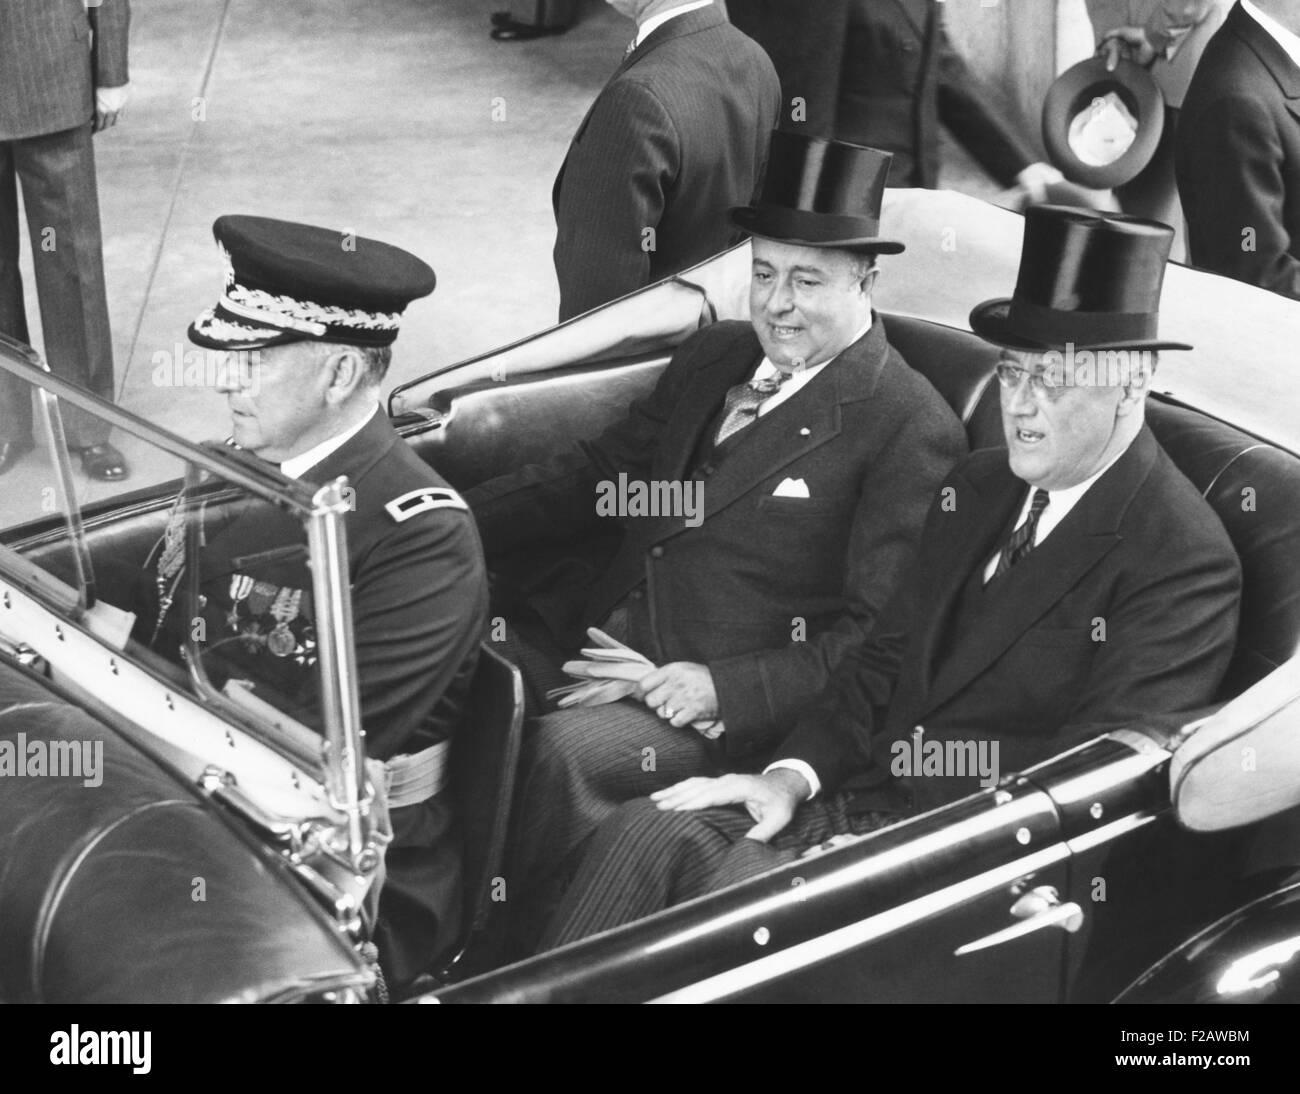 President Franklin Roosevelt with President Anastasio Somoza of Nicaragua. Washington, D.C. May 5, 1939. (CSU_2015 - Stock Image